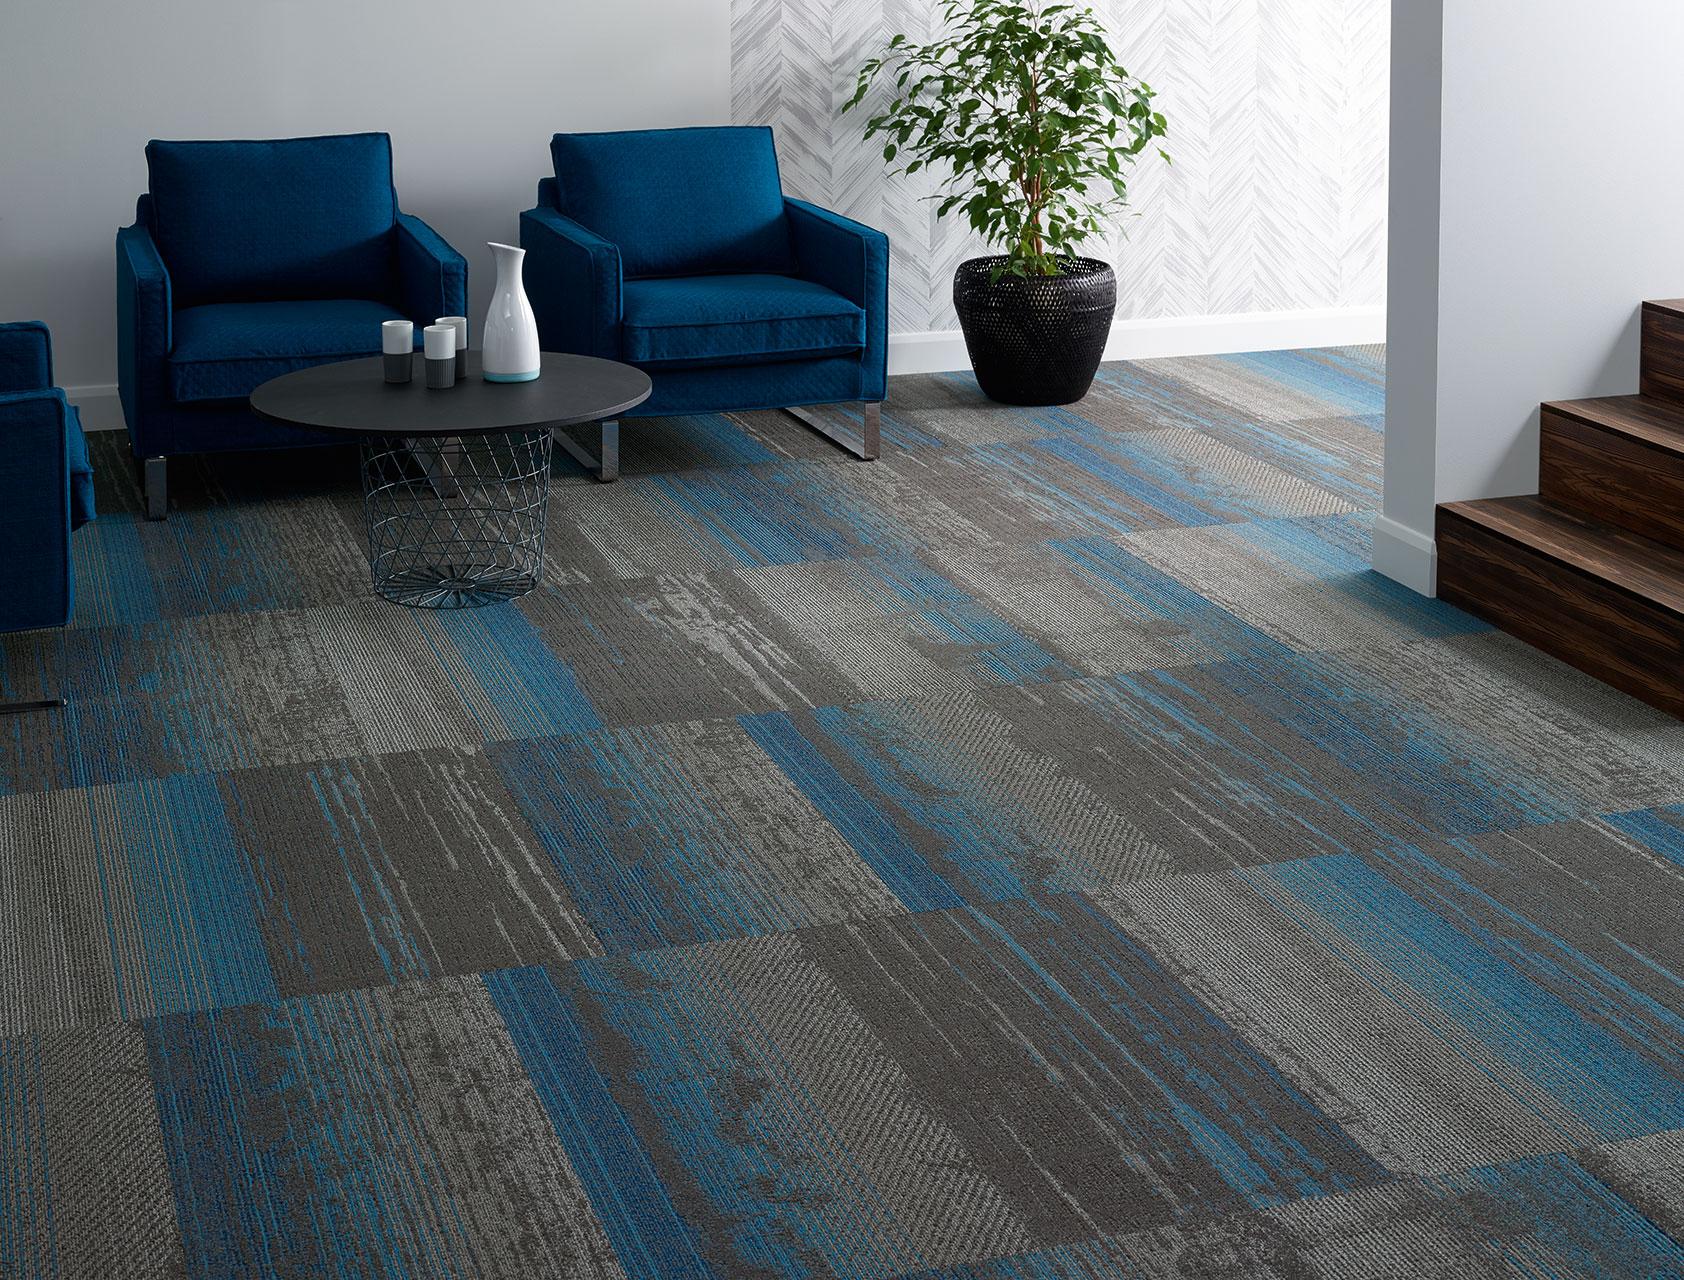 Seattle Music Row Ycseatt12331 Commercial Carpet Tiles